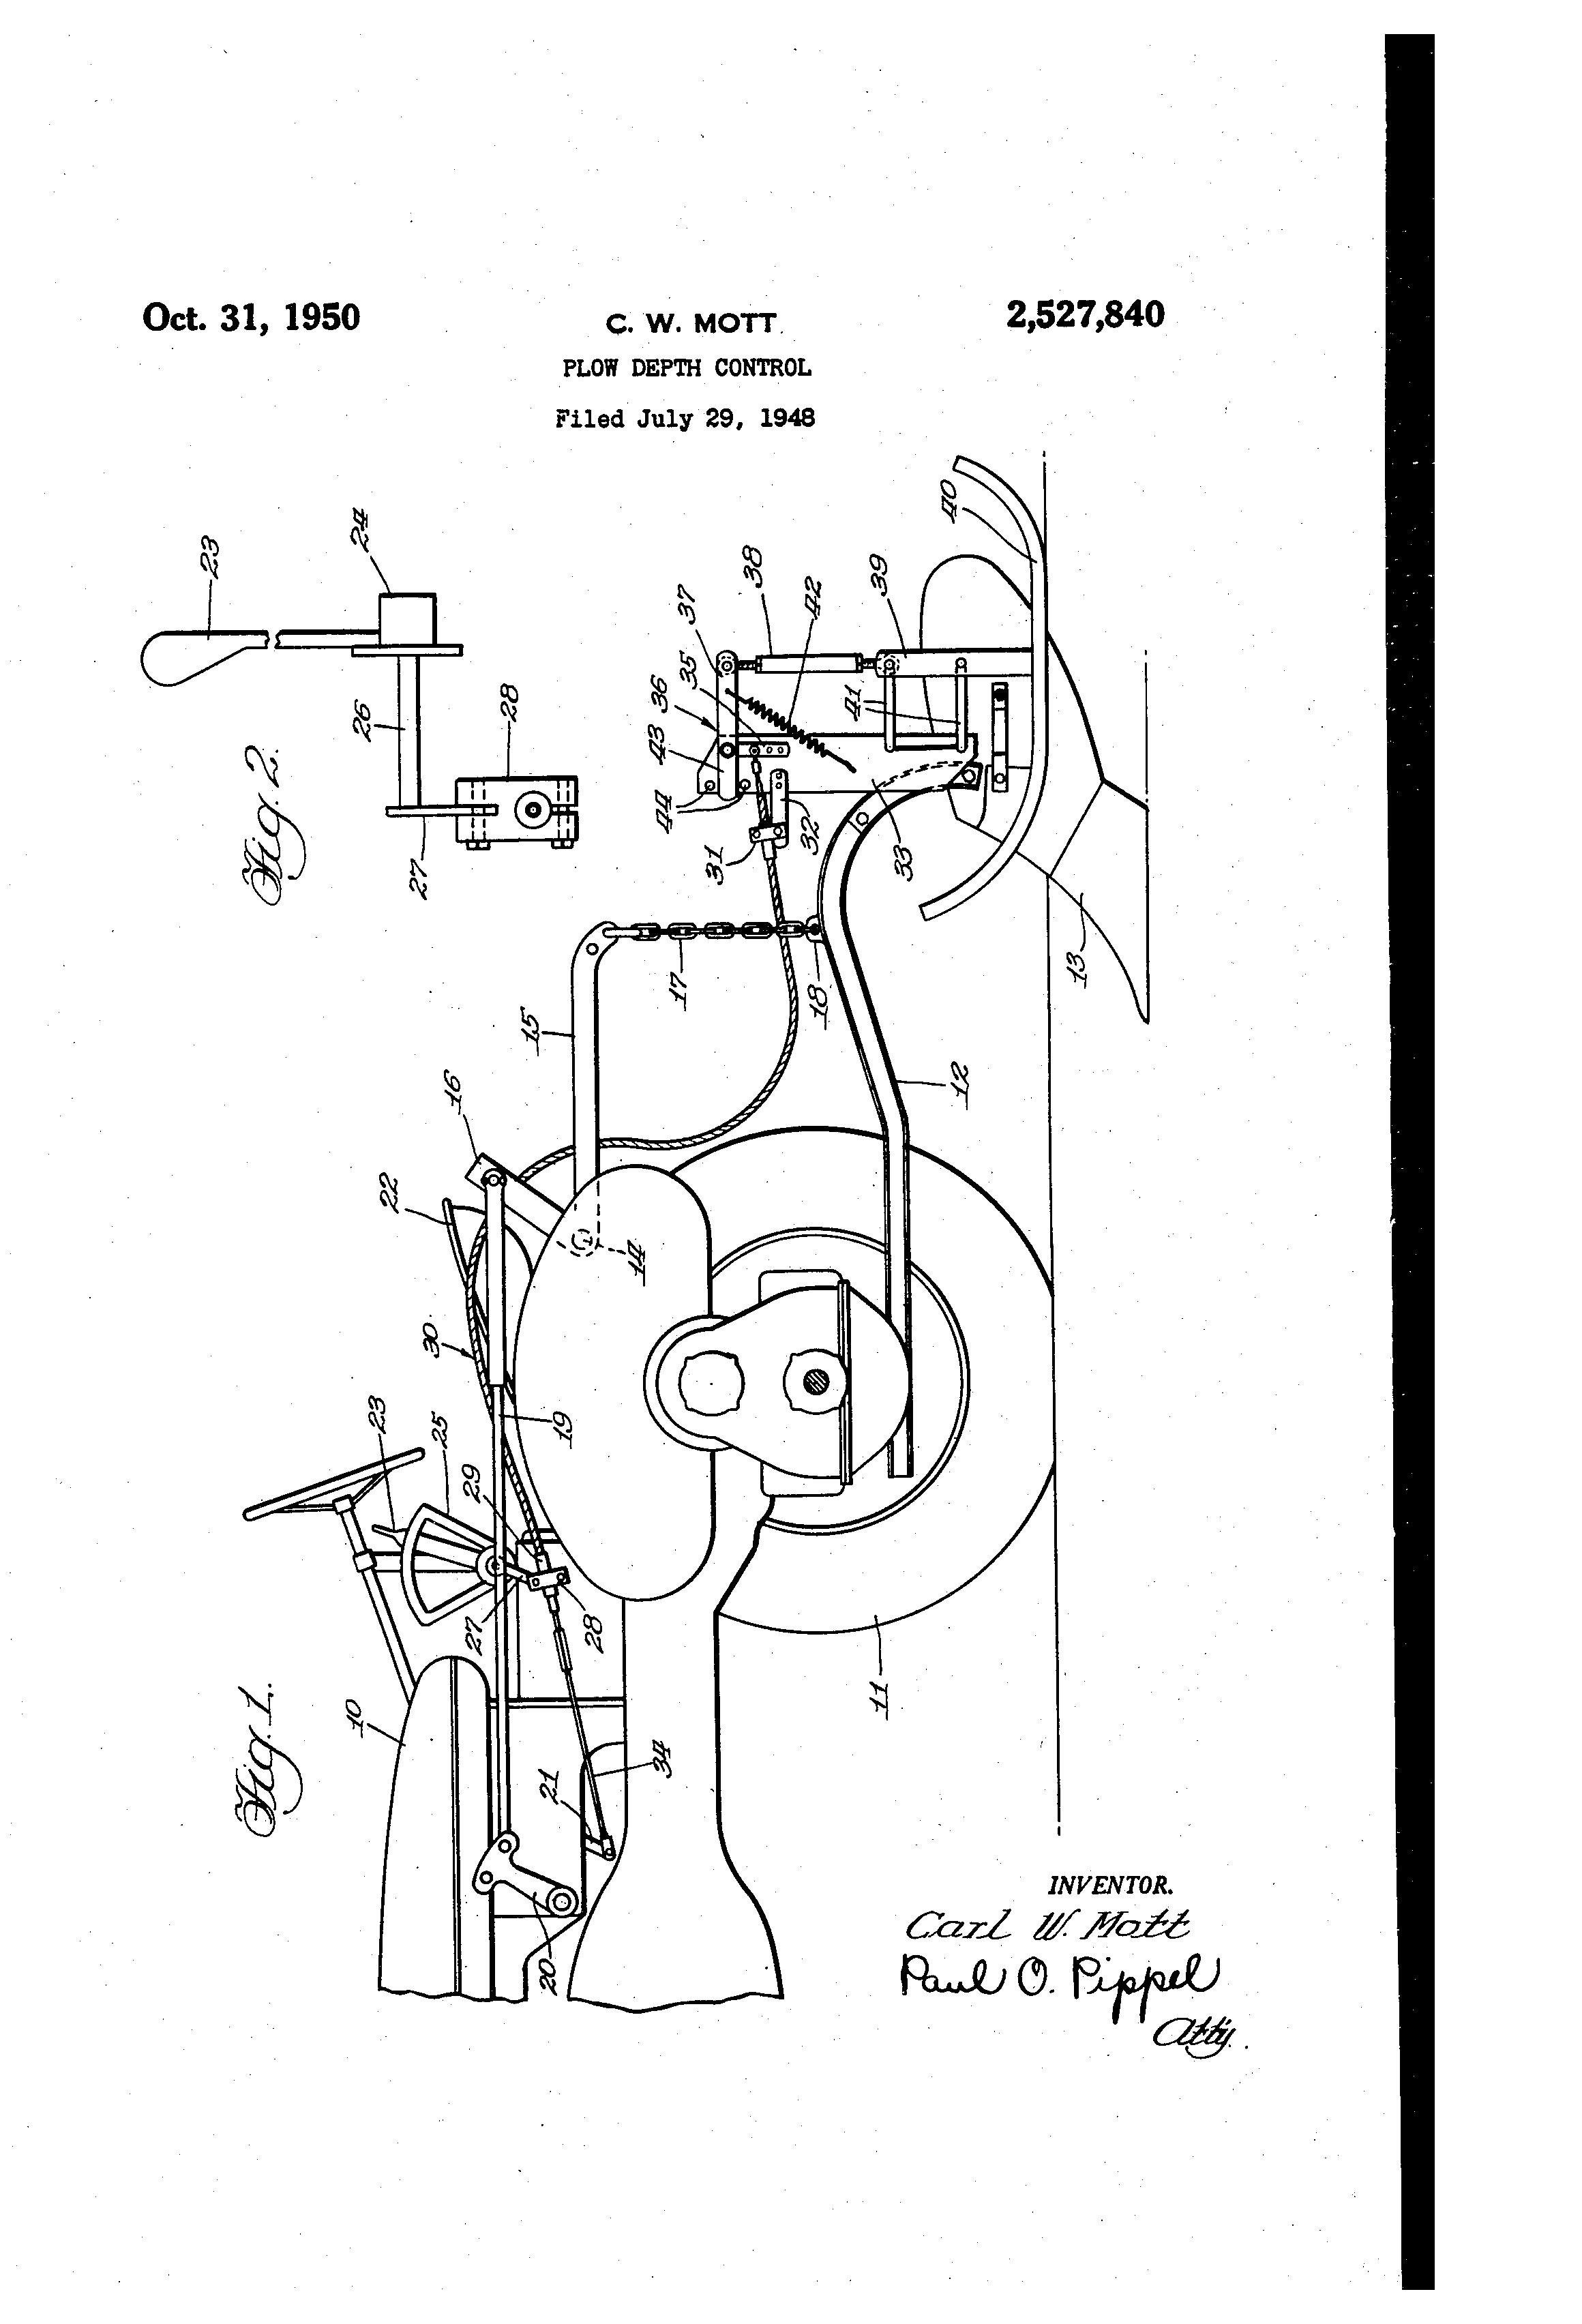 Patent US2527840 - Plow depth control - Google Patents